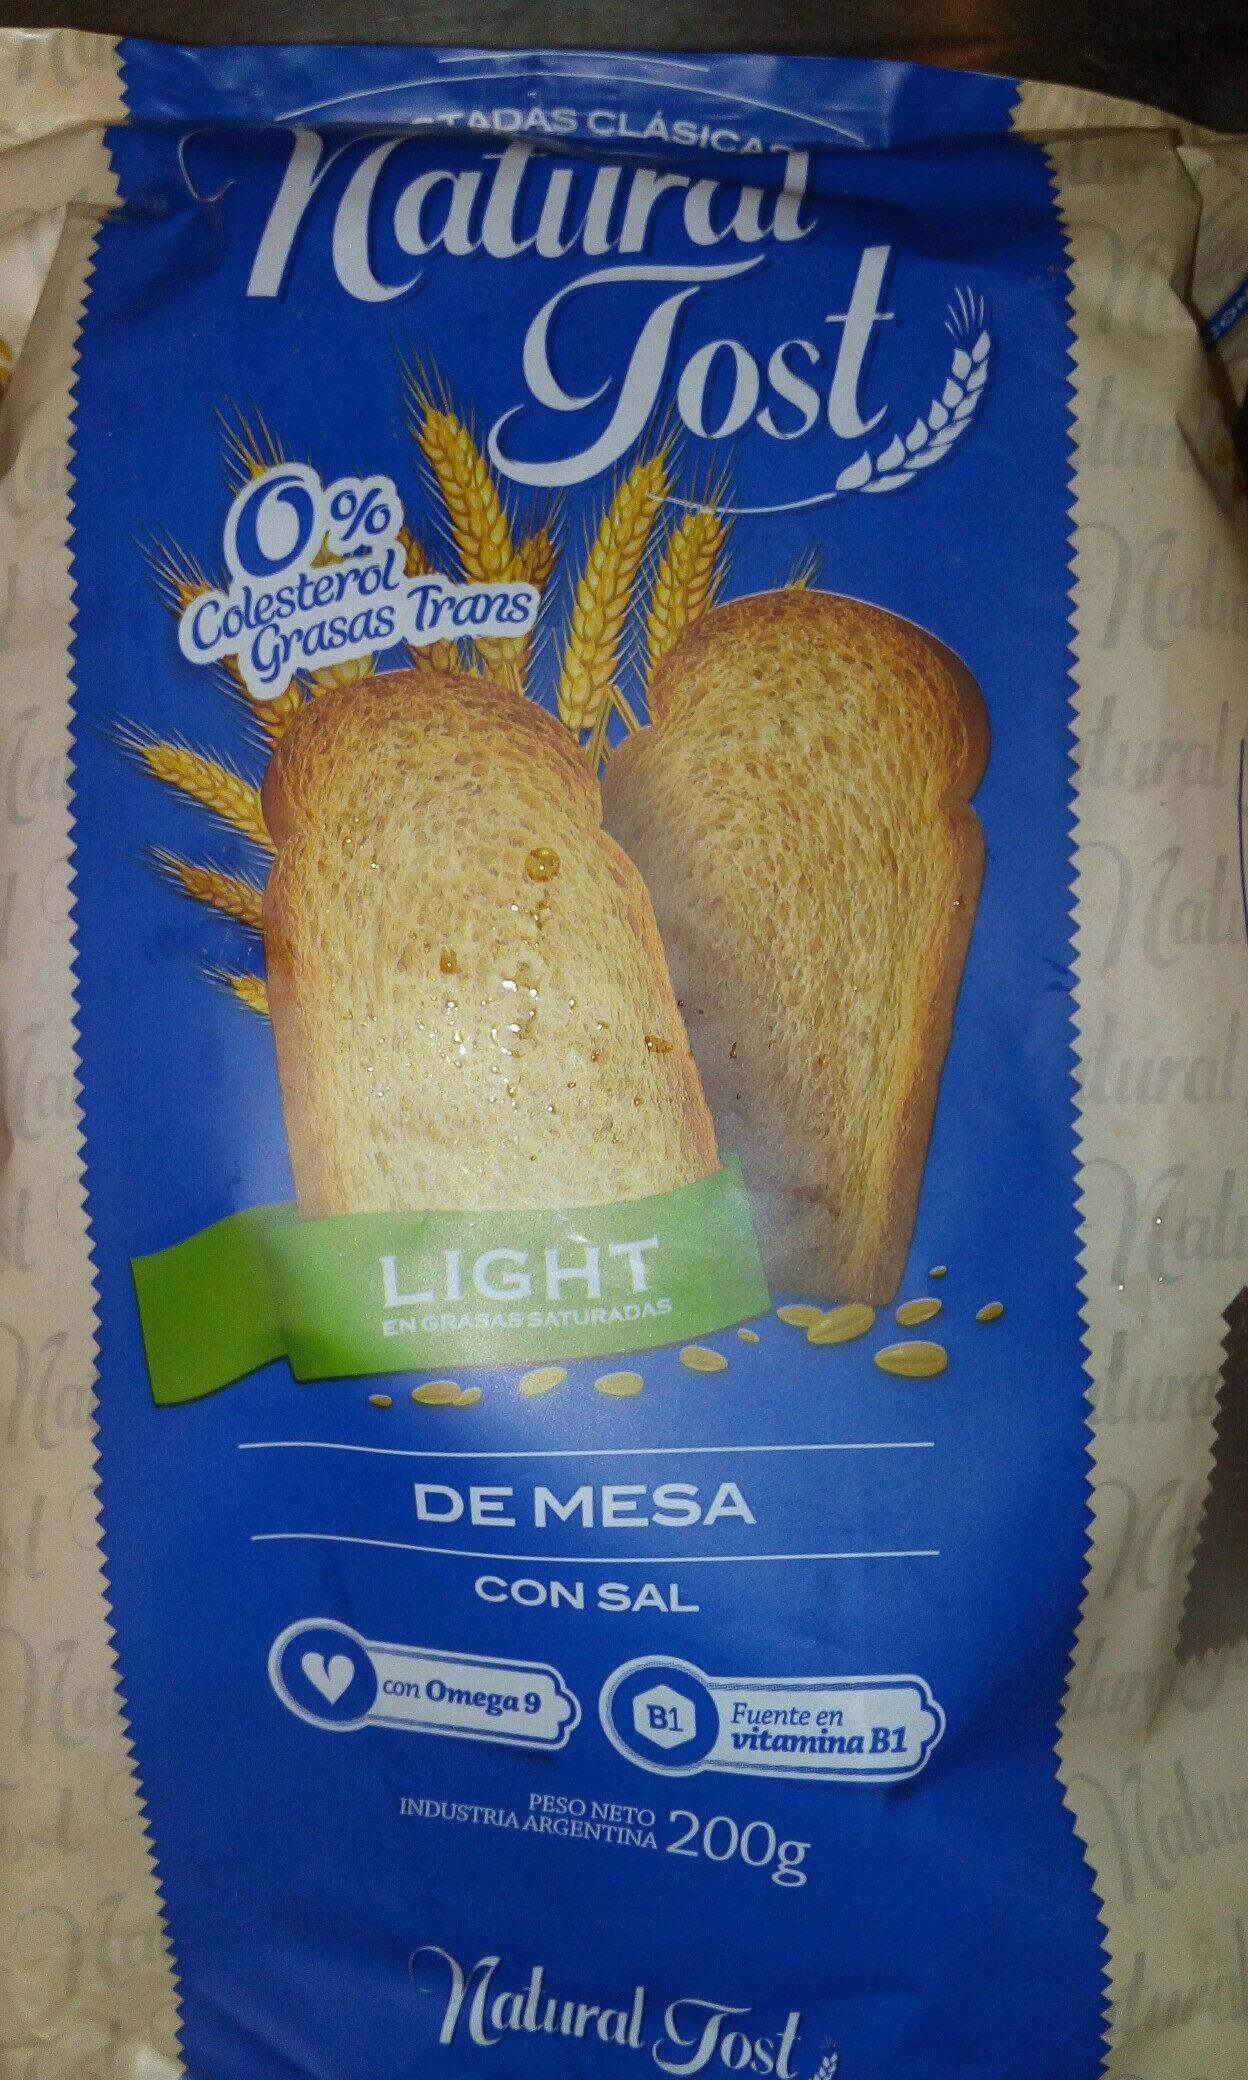 Tostadas Natural Tost Light - Product